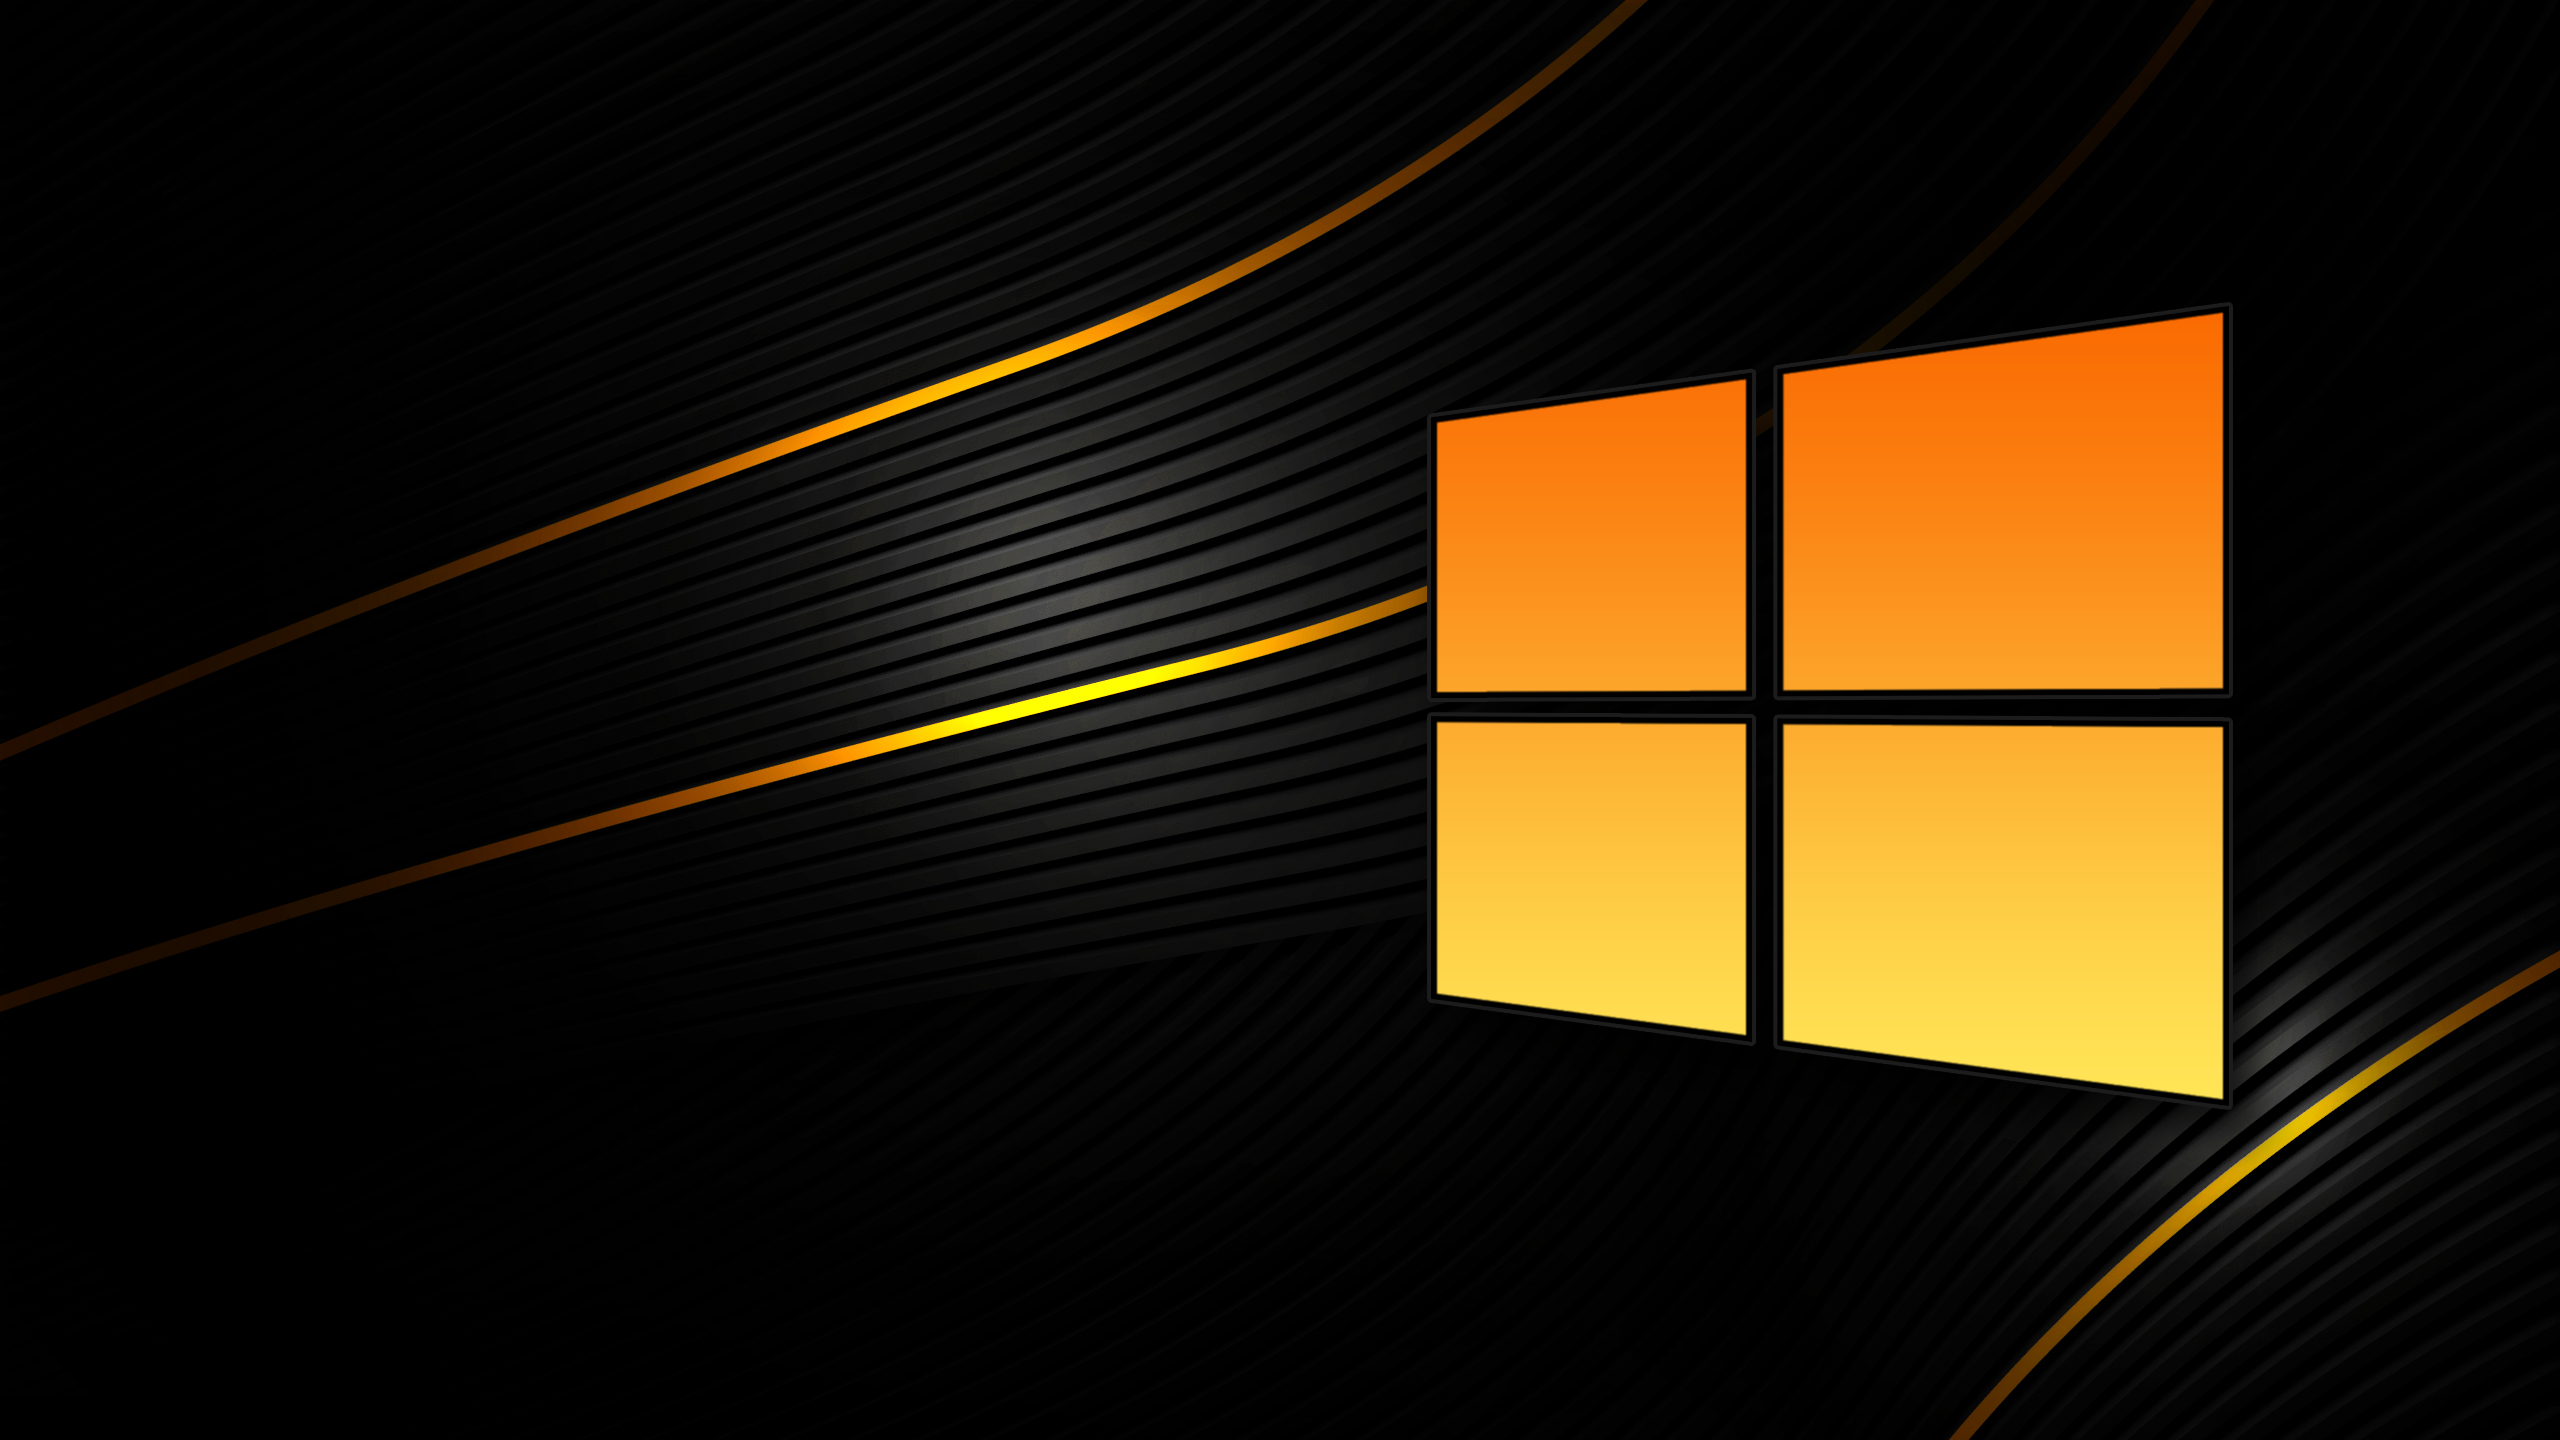 lock screen background change windows 10 a lock wallpaperpng 2560x1440